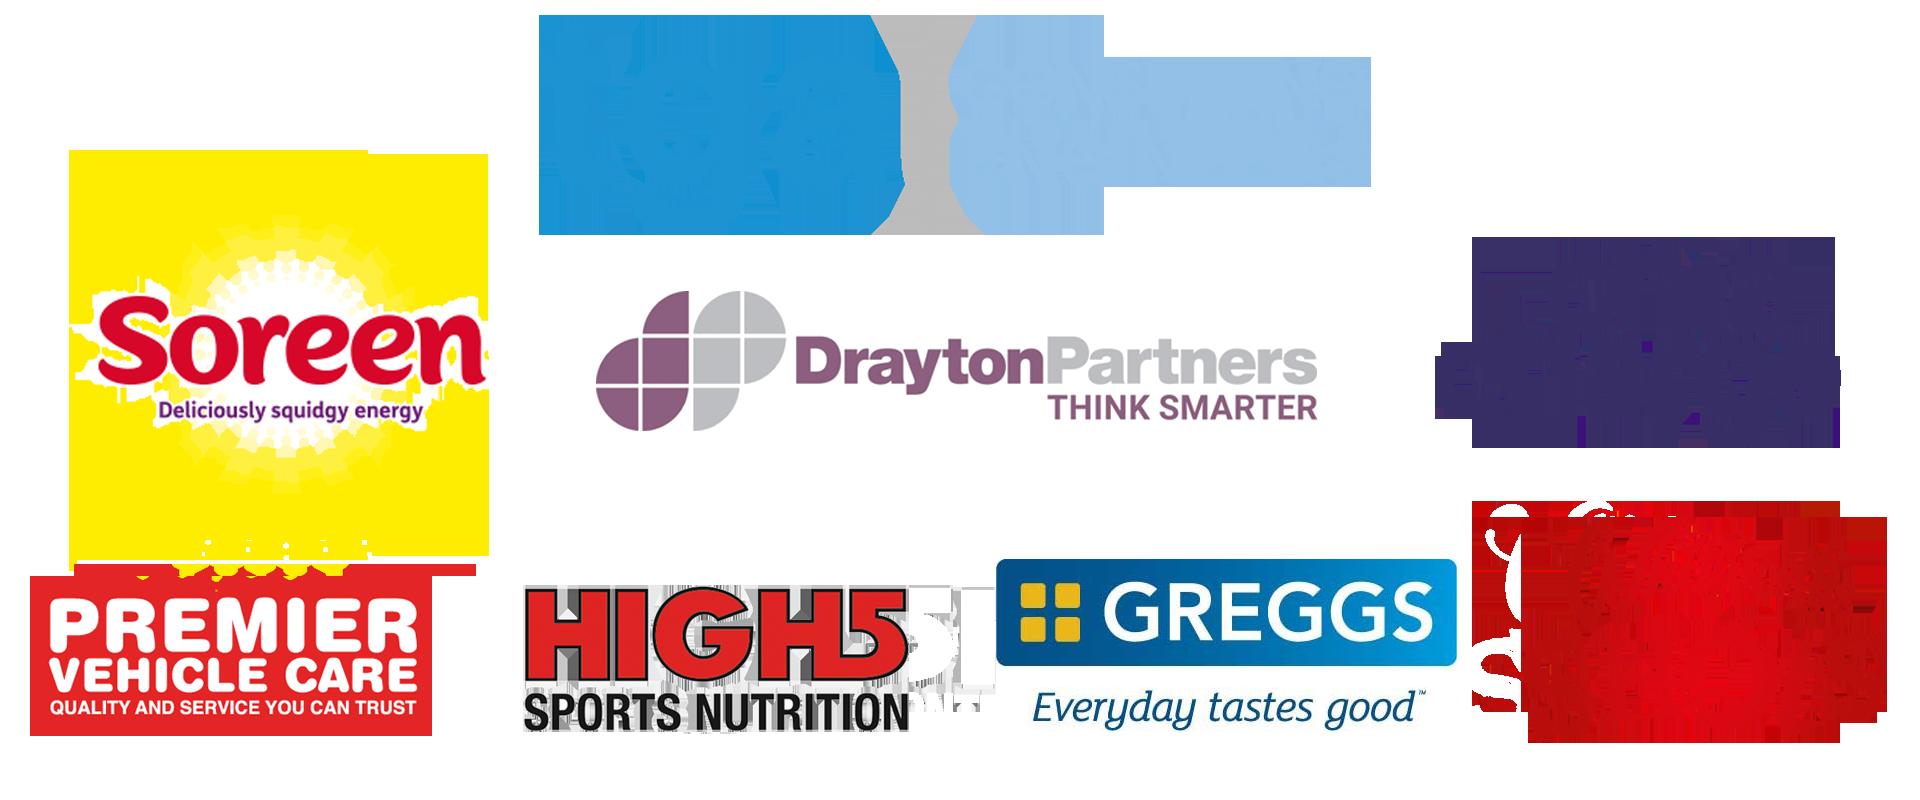 Bridges Of The Tyne 2018 Sponsors